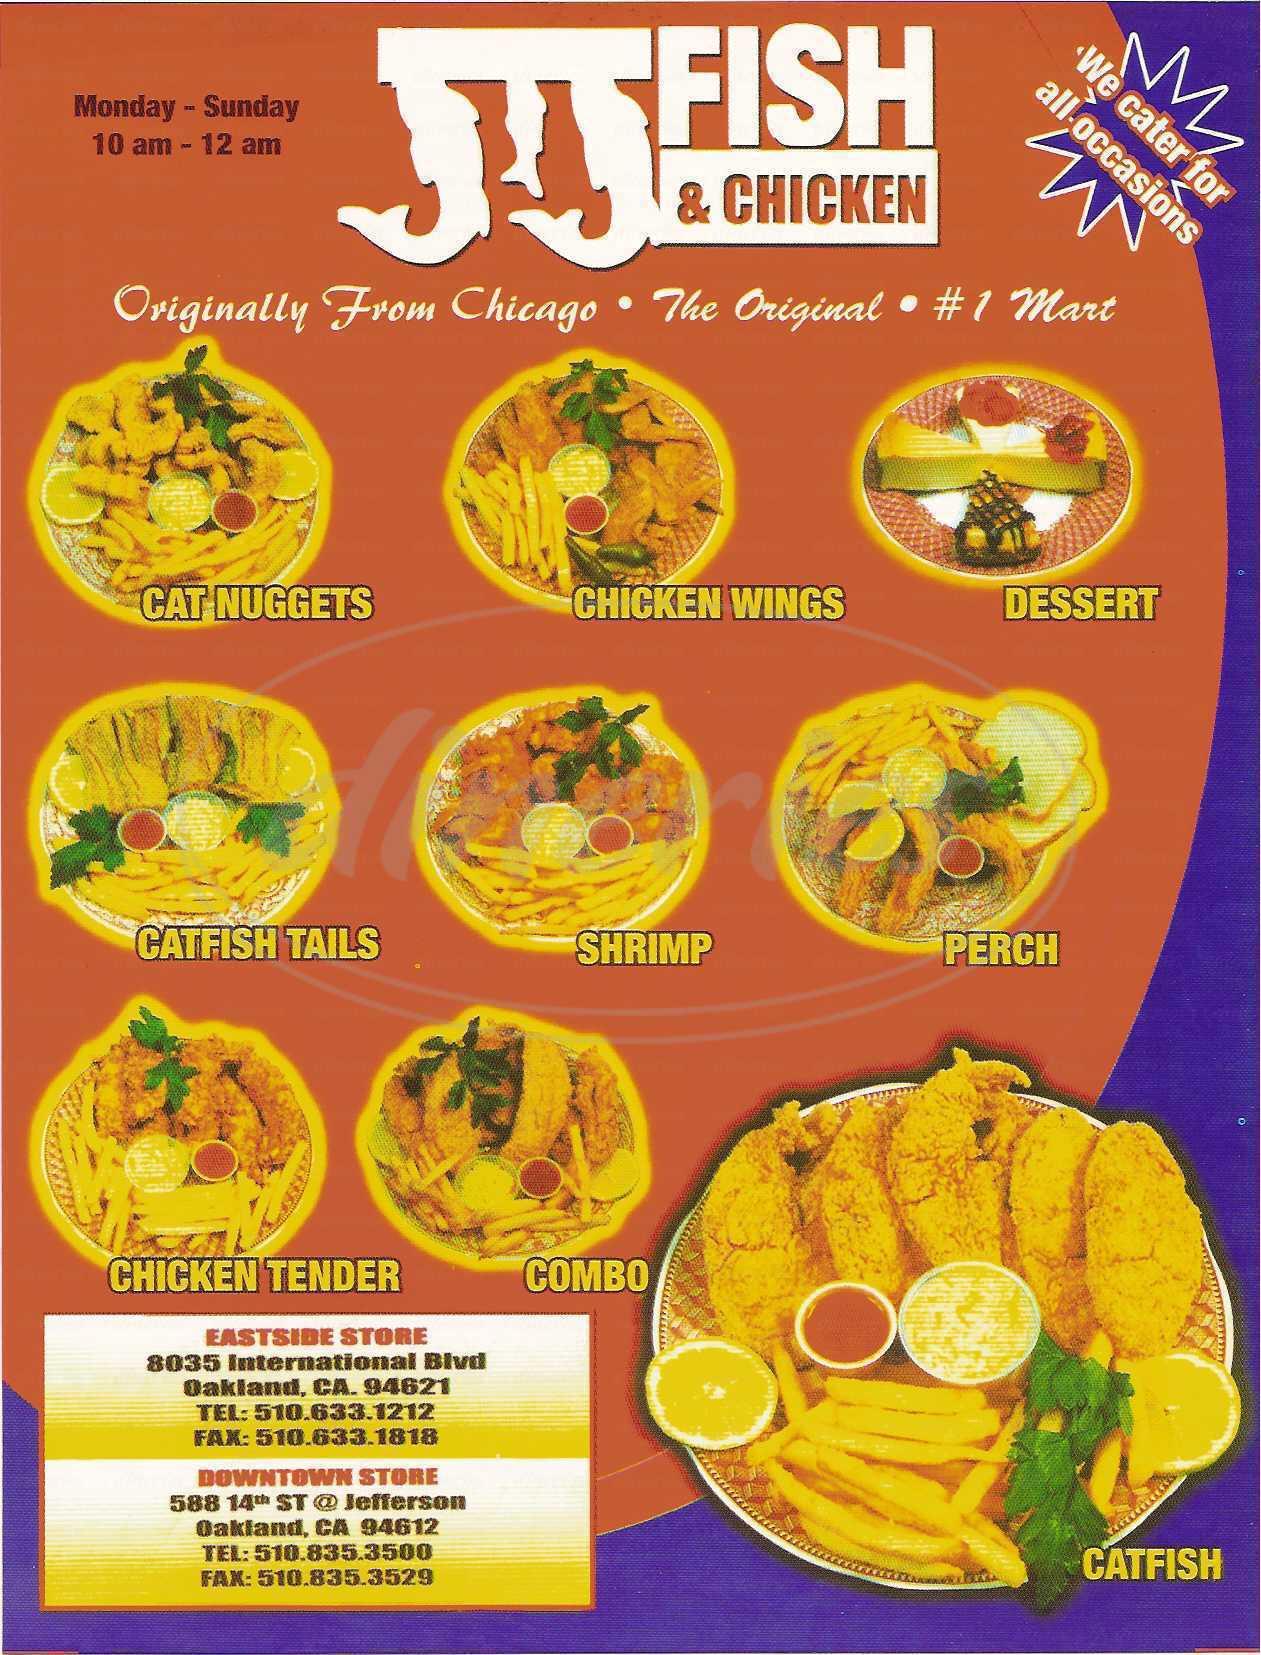 menu for JJ Fish & Chicken